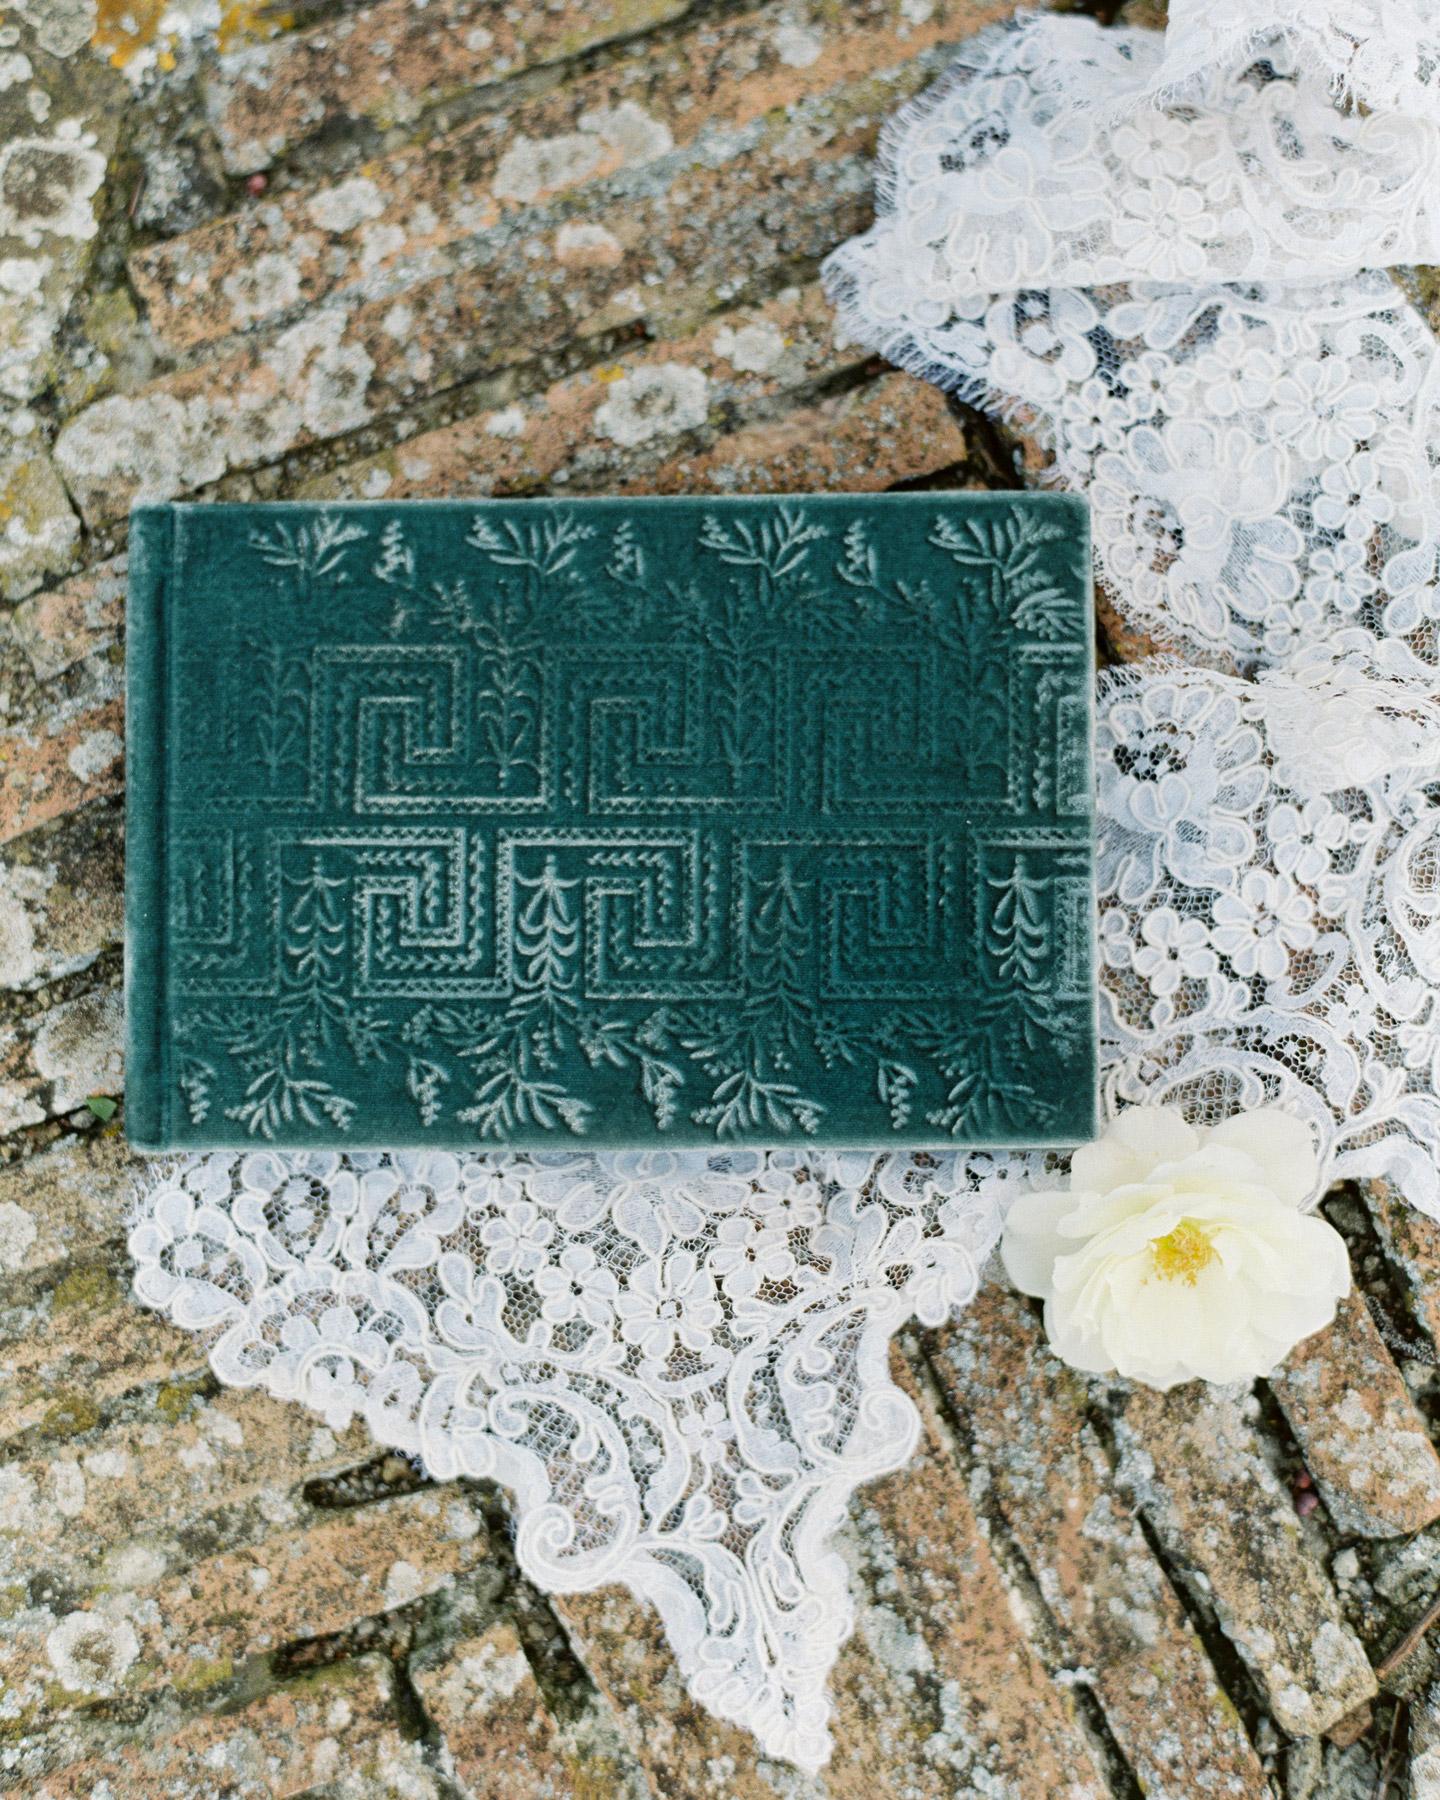 christine-dagan-wedding-velvet-book-4311_13-s113011-0616.jpg